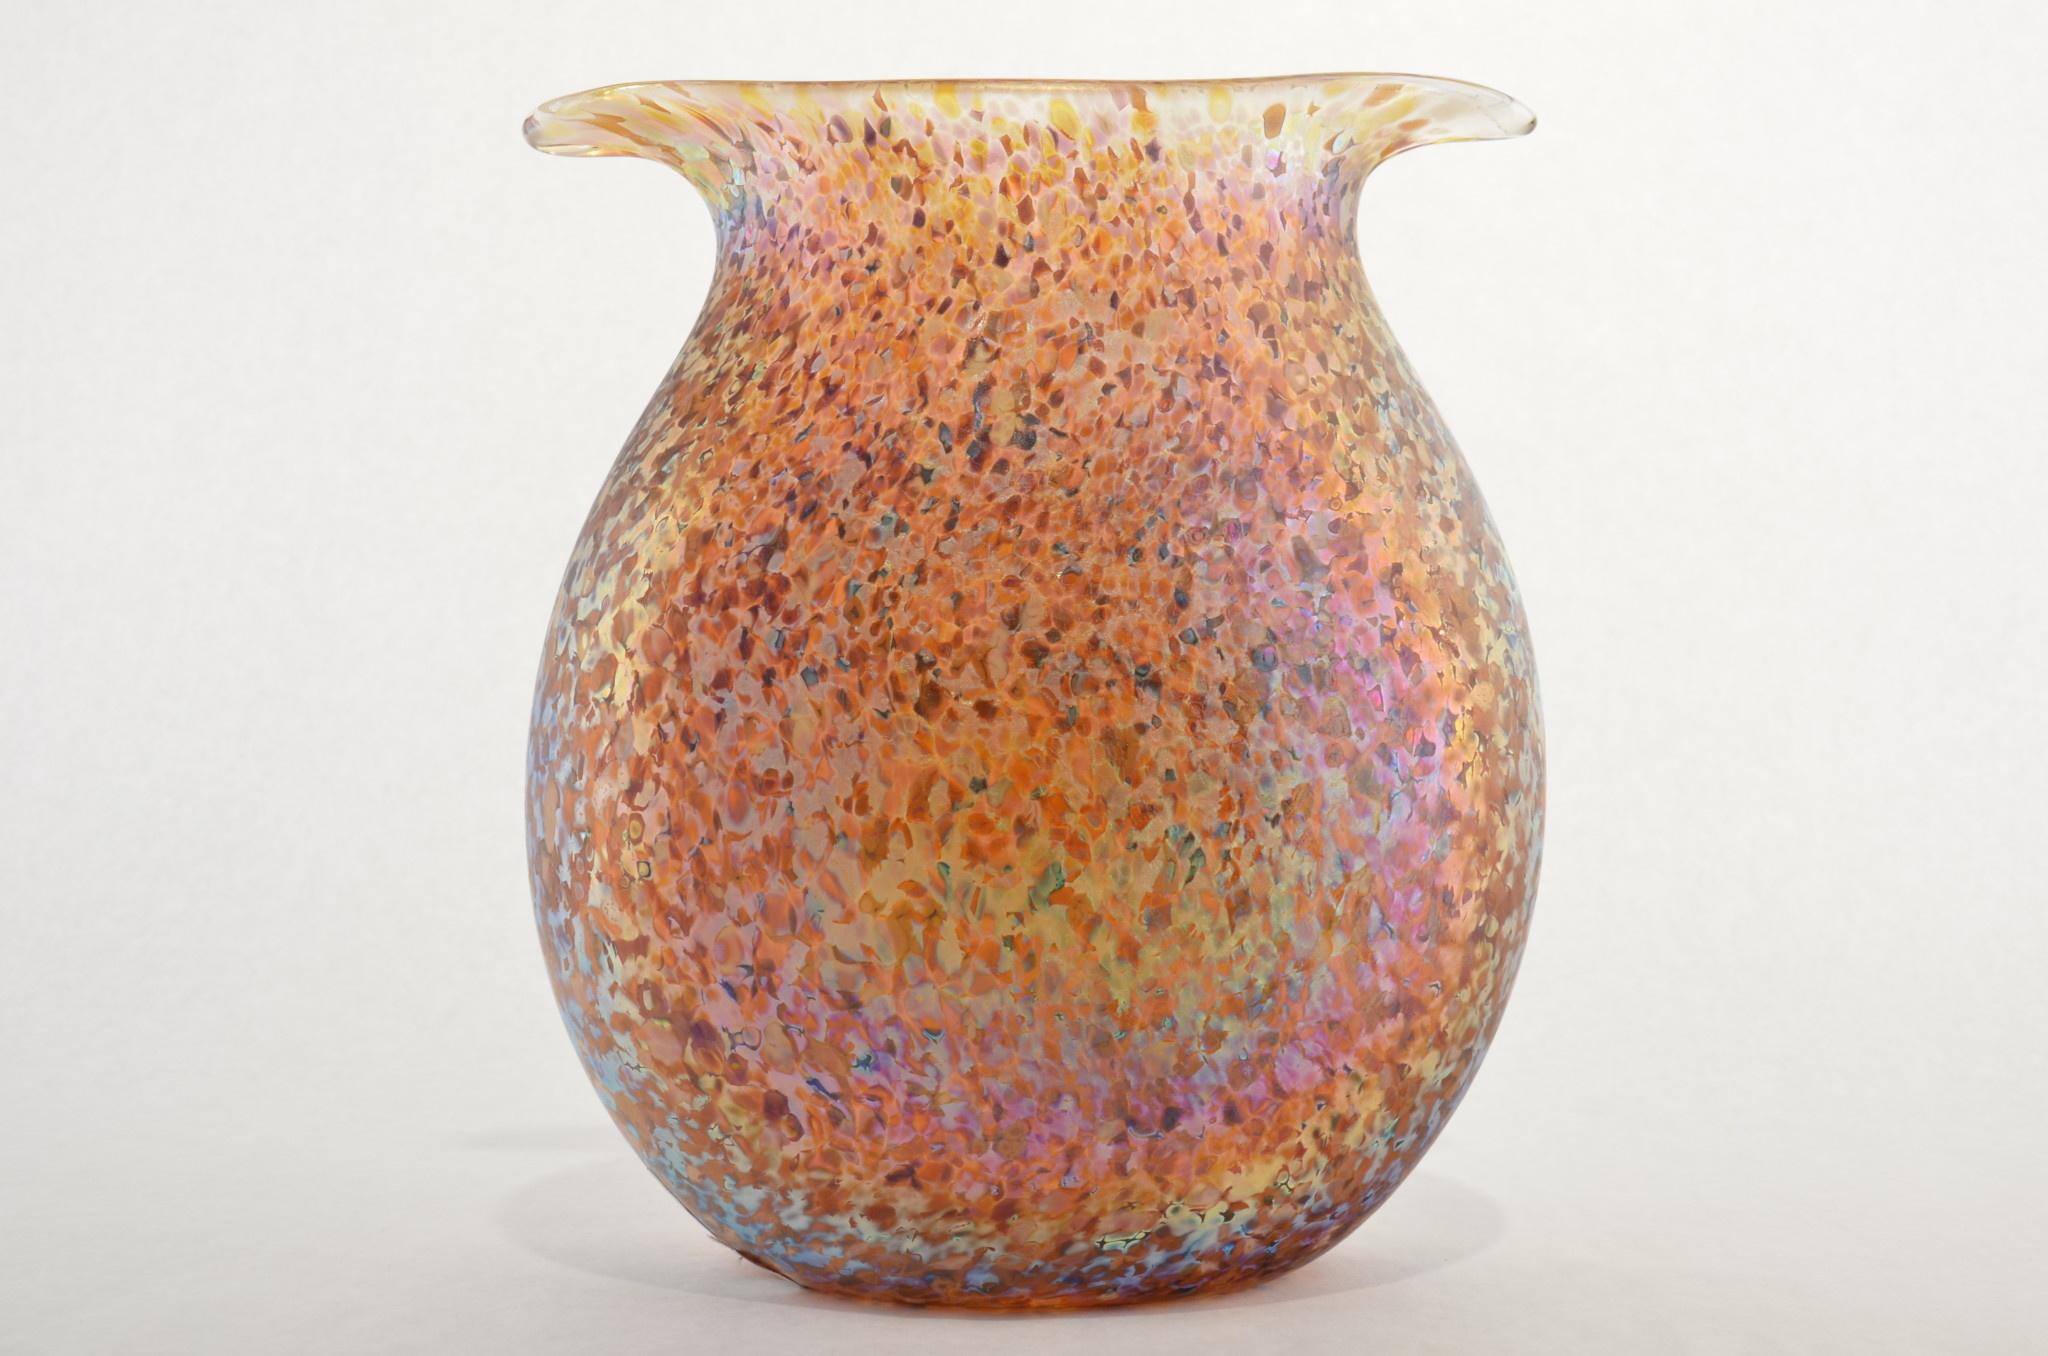 Eric Dandurand Amber Confetti Creve Vase - Eric Dandurand